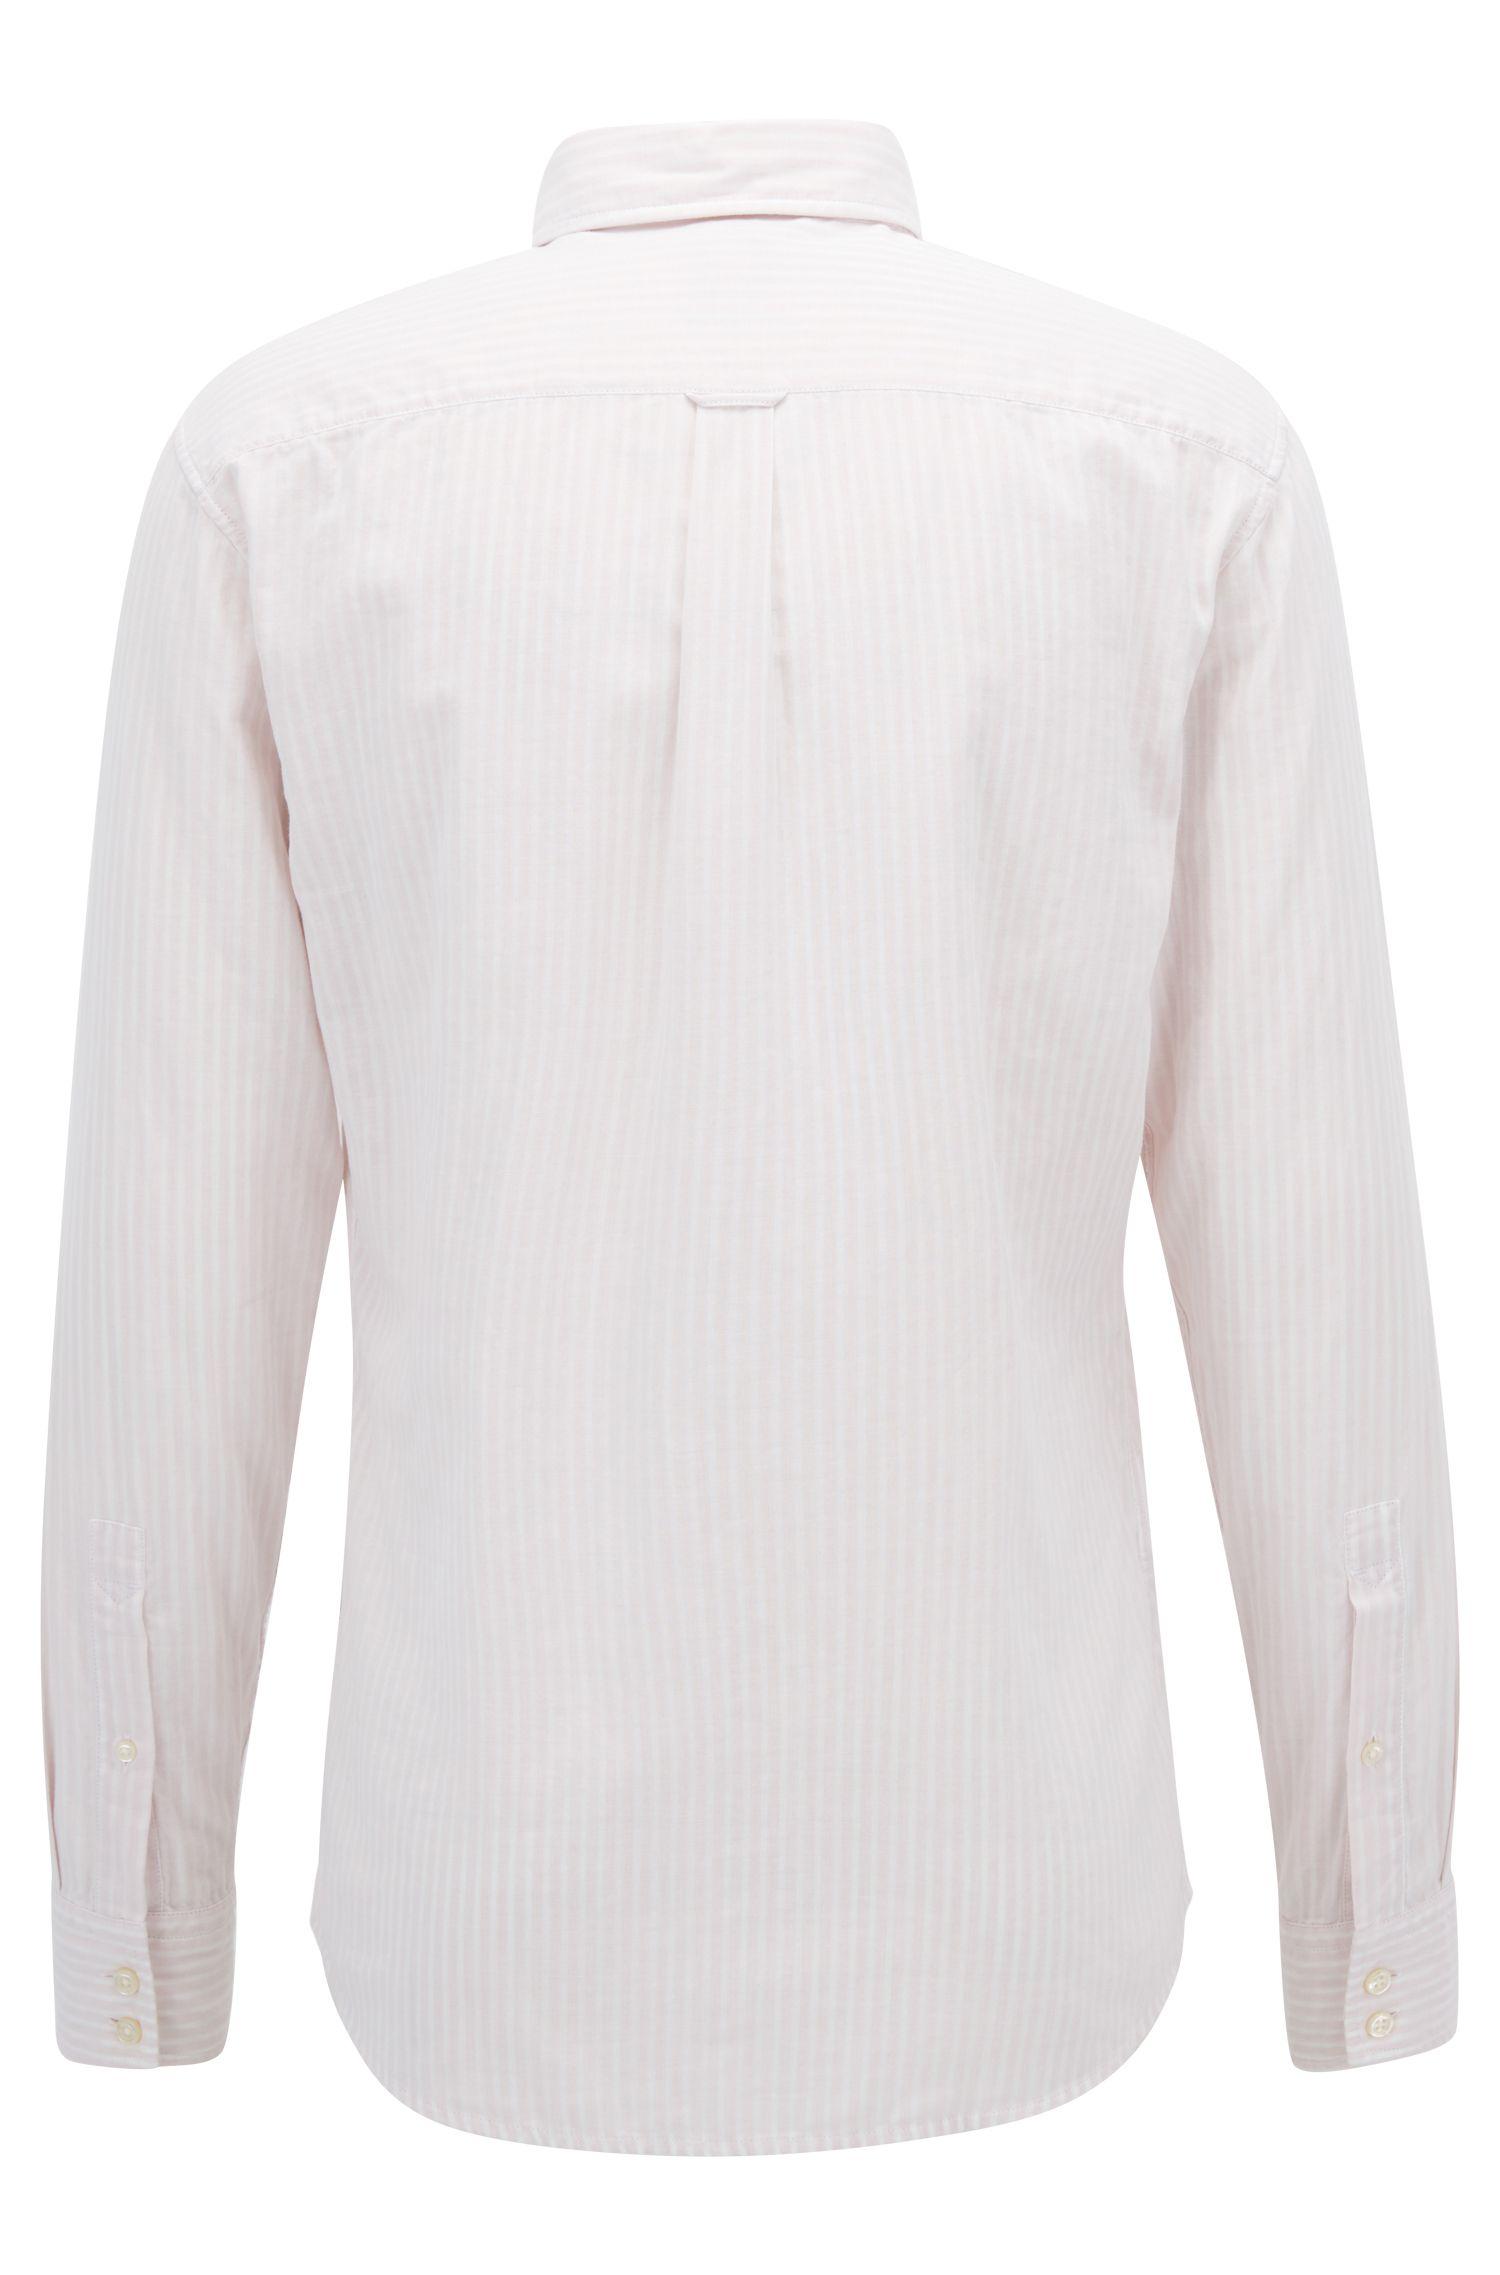 Cotton Sport Shirt, Slim Fit | Epreppy